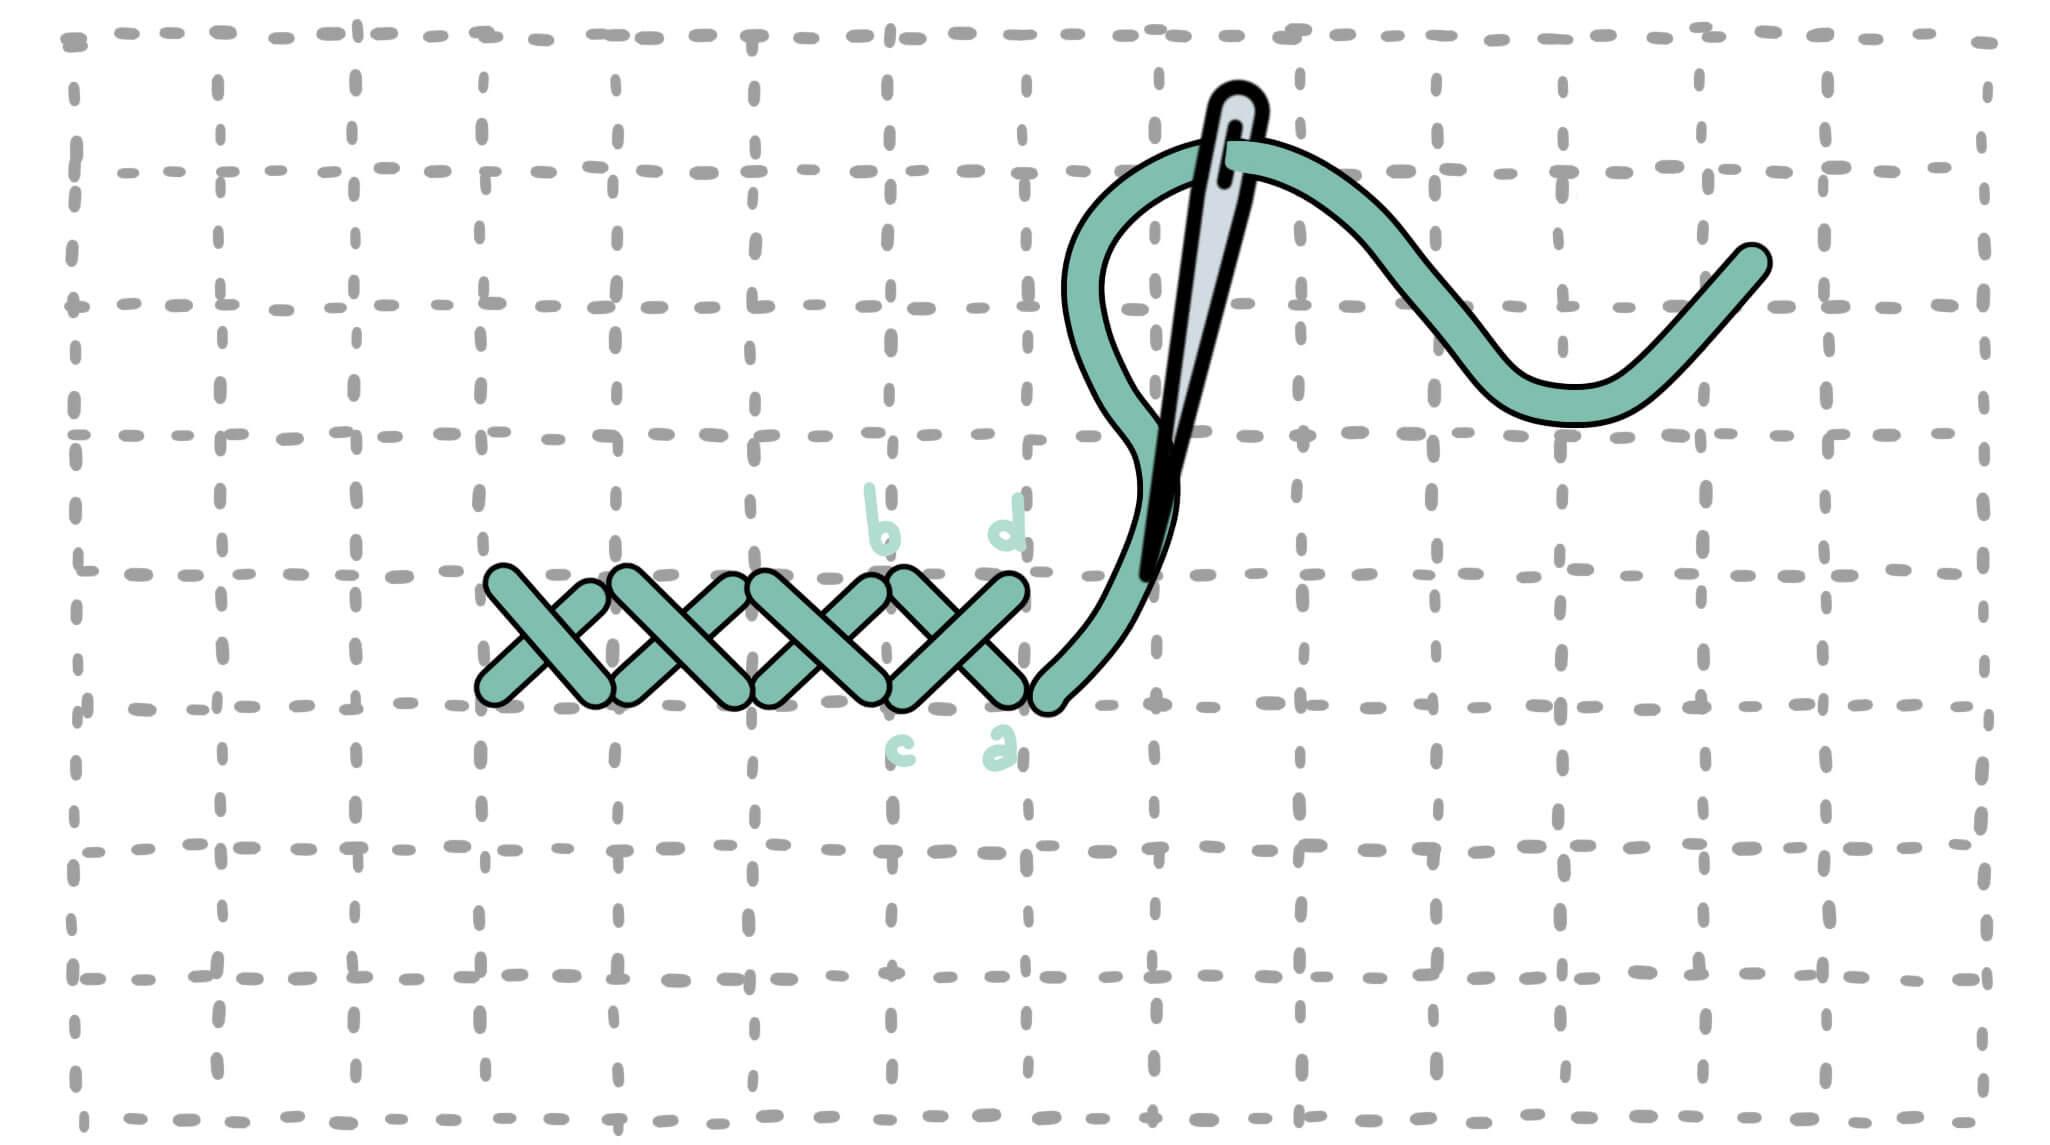 5 3 - Cross stitch (kruissteek)